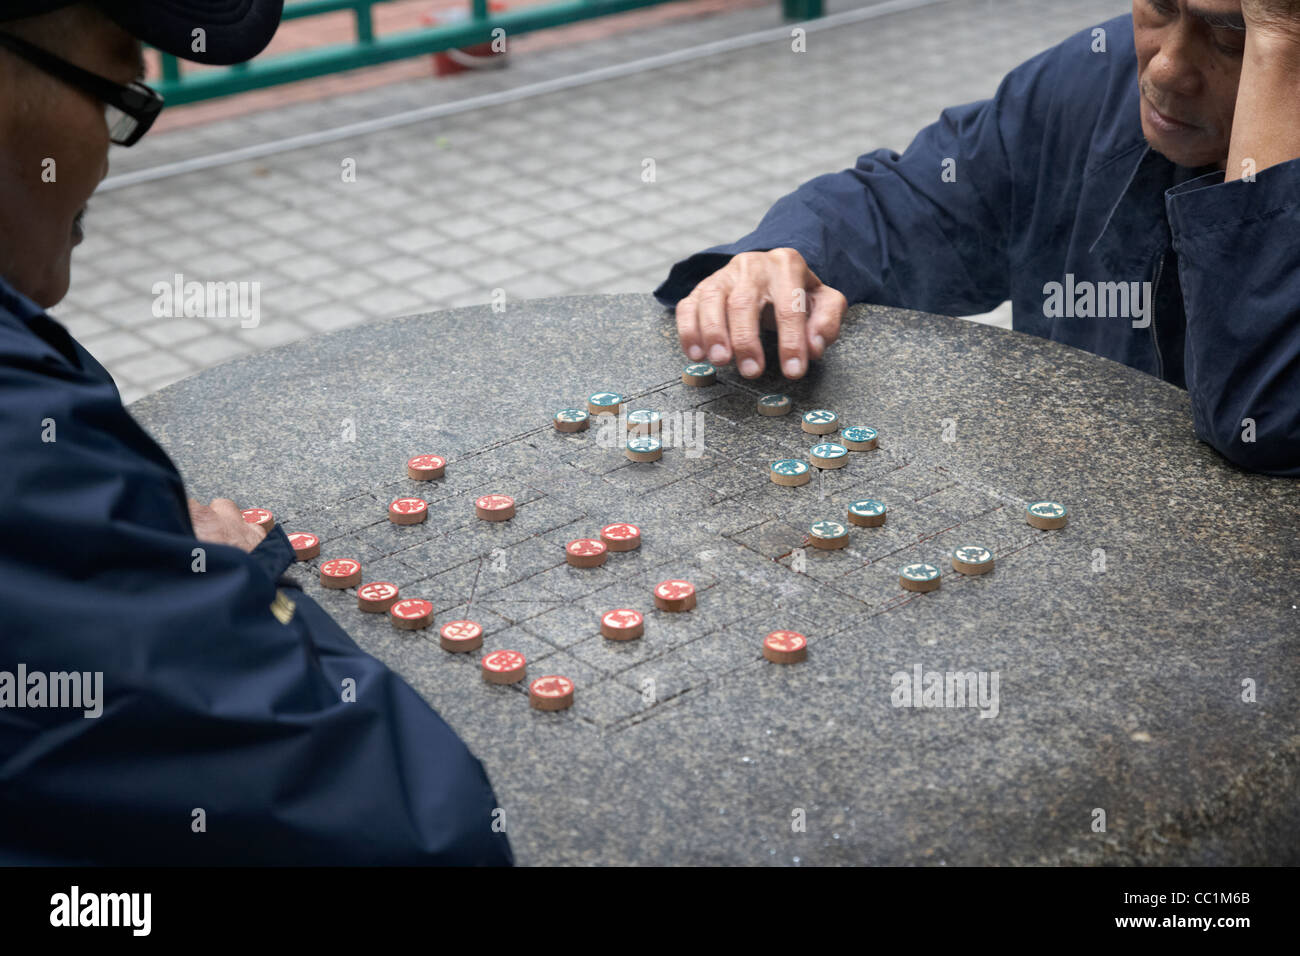 chinese men playing chinese chess at an outdoor municipal park table in hong kong hksar china asia - Stock Image